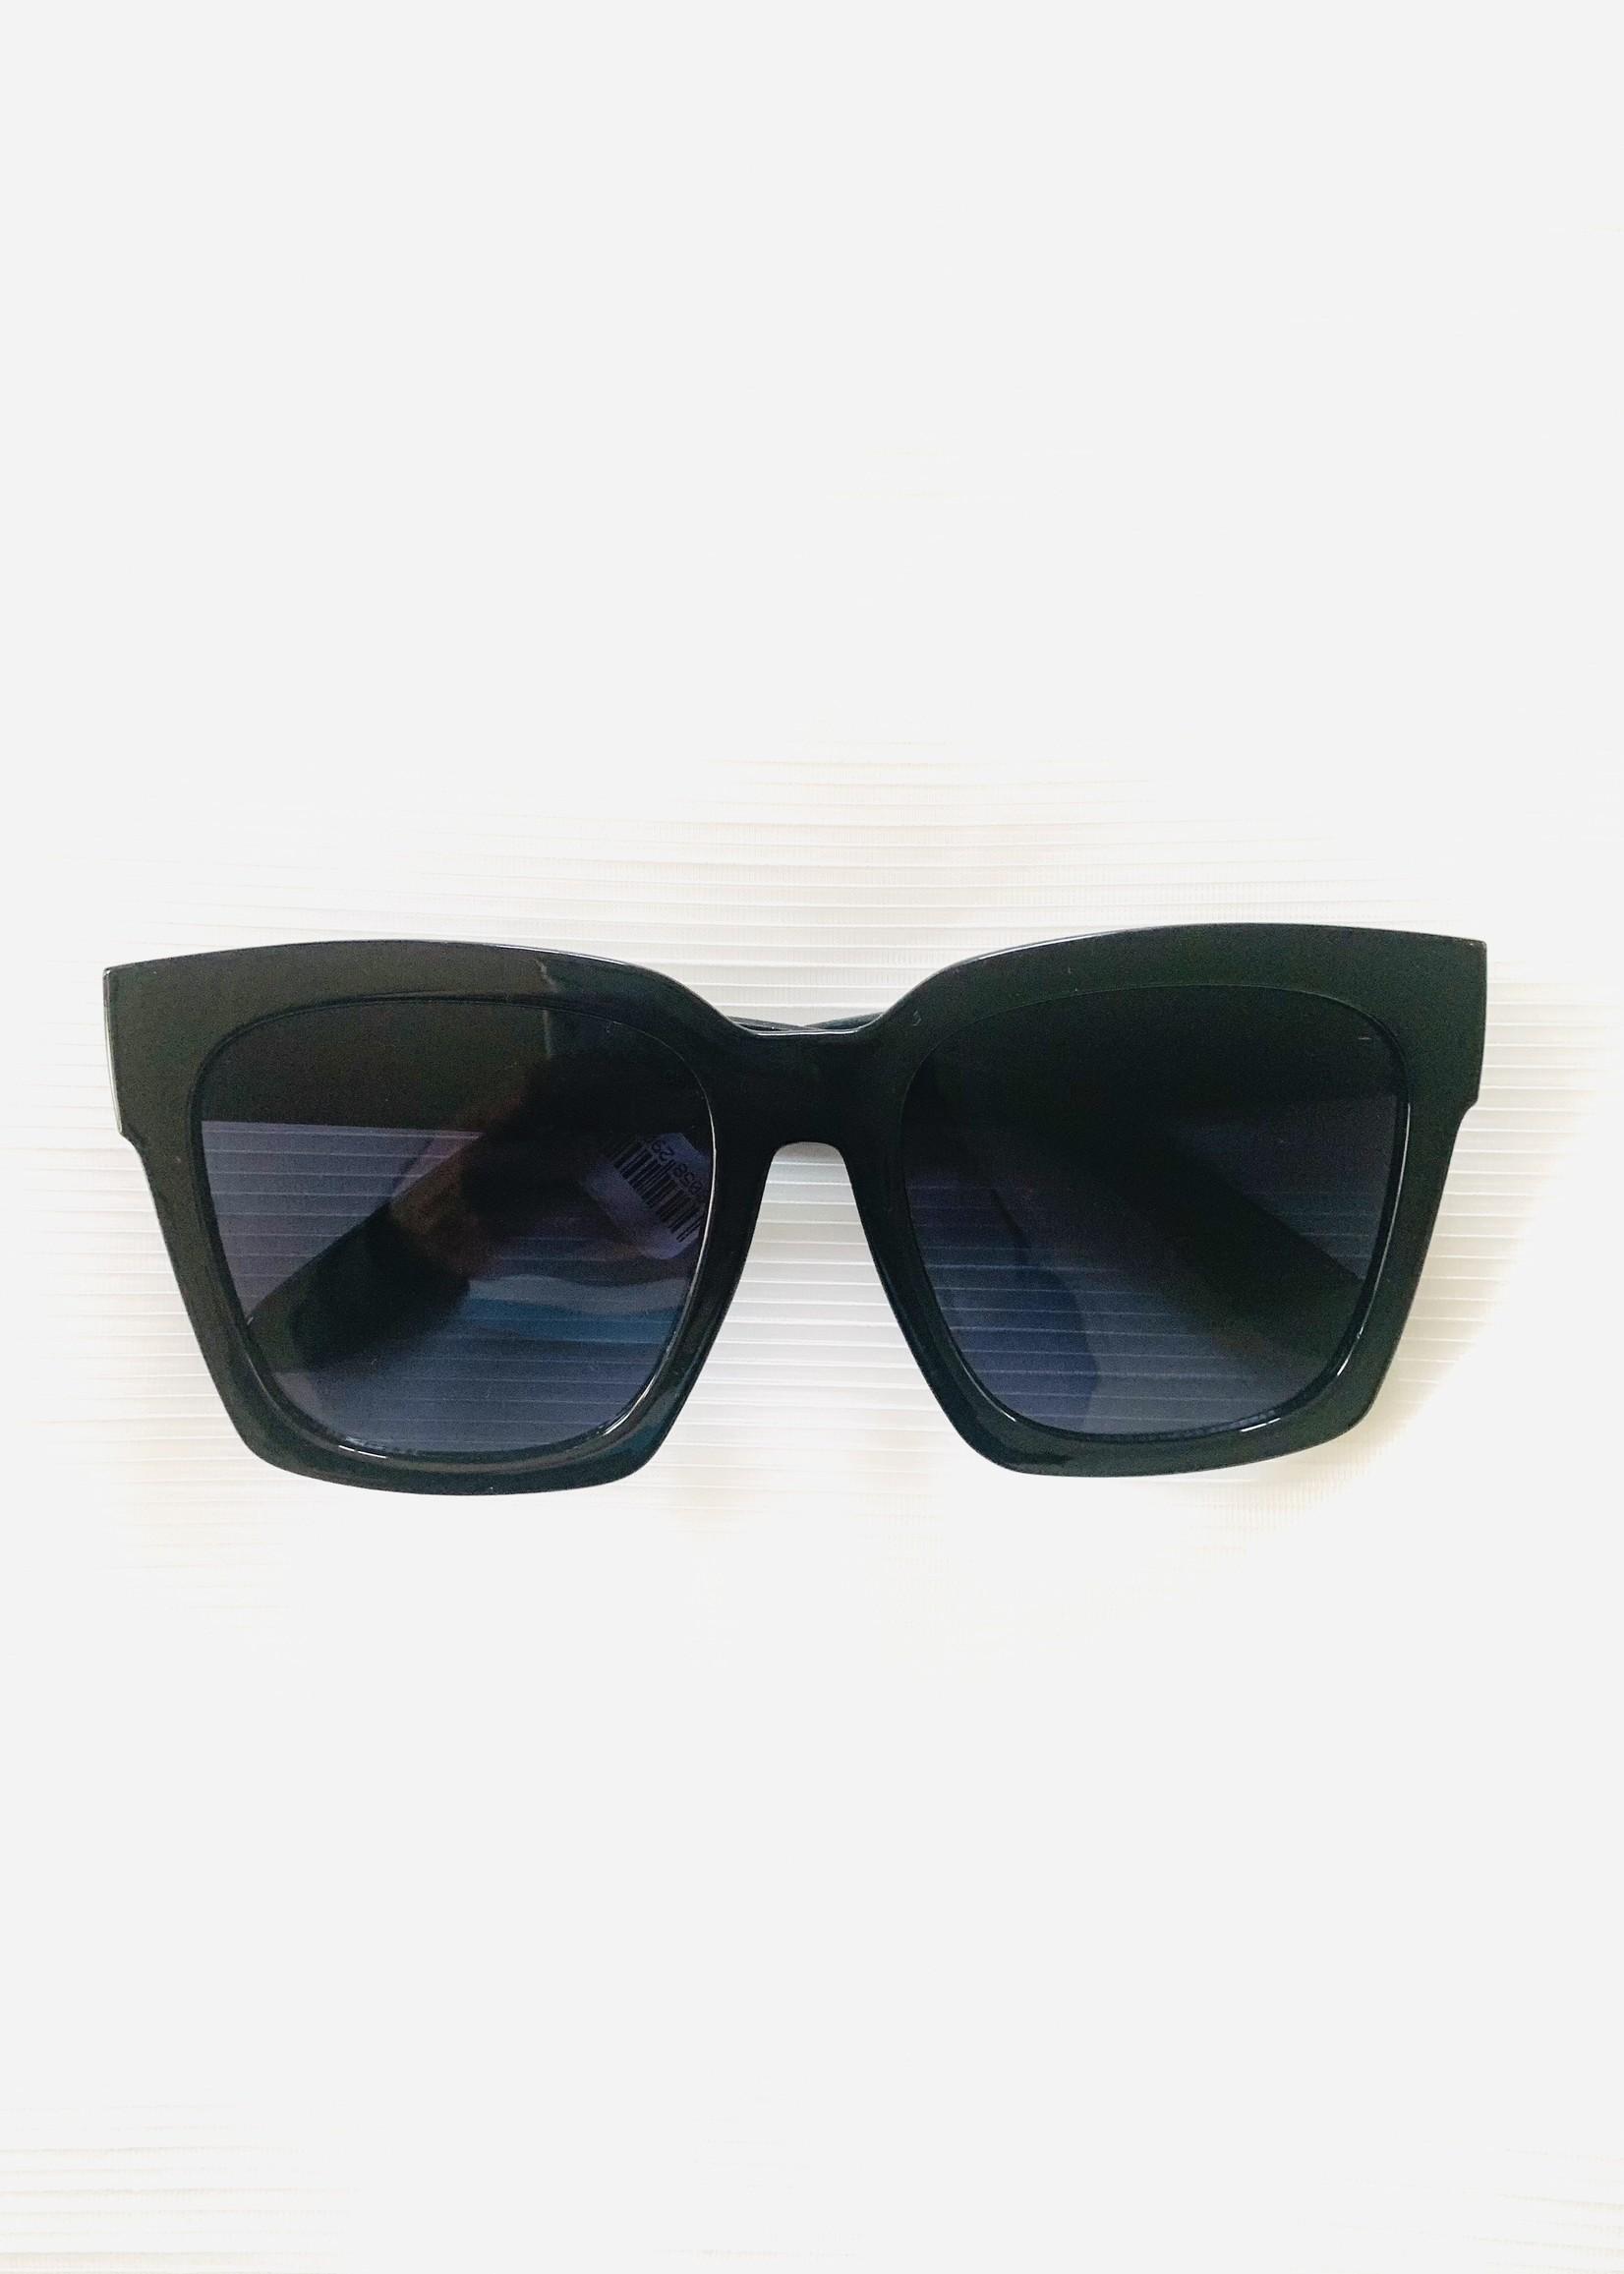 1225 sunglasses